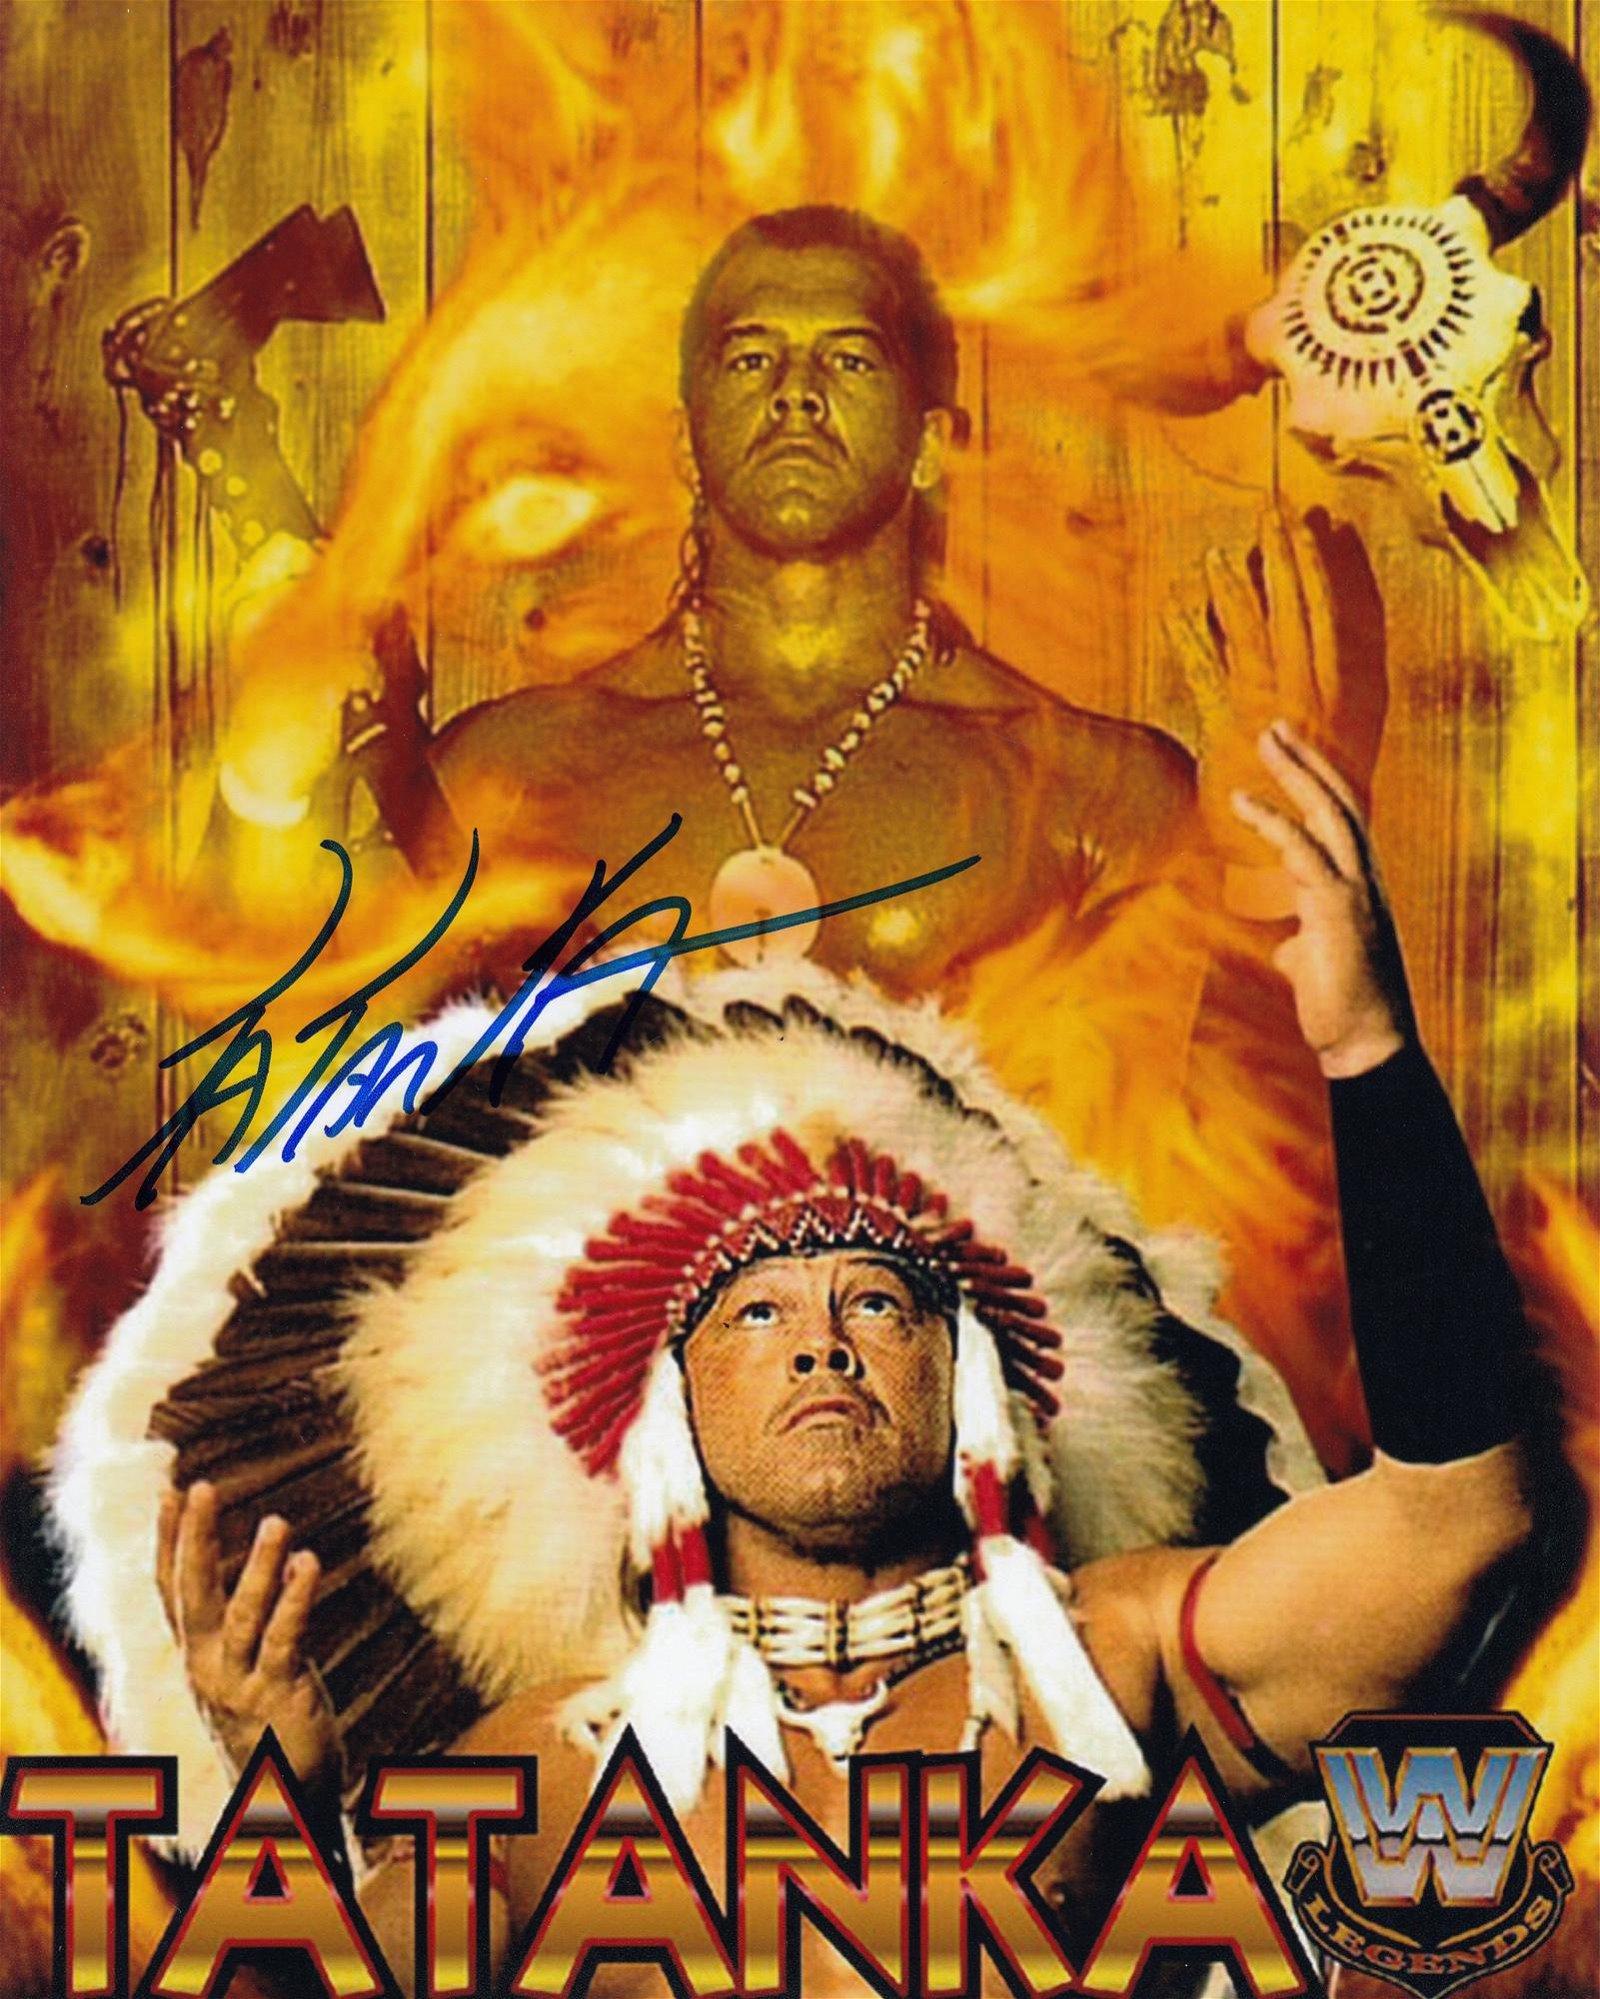 Blowout Sale! WWE/WWF Tatanka hand signed 10x8 photo.